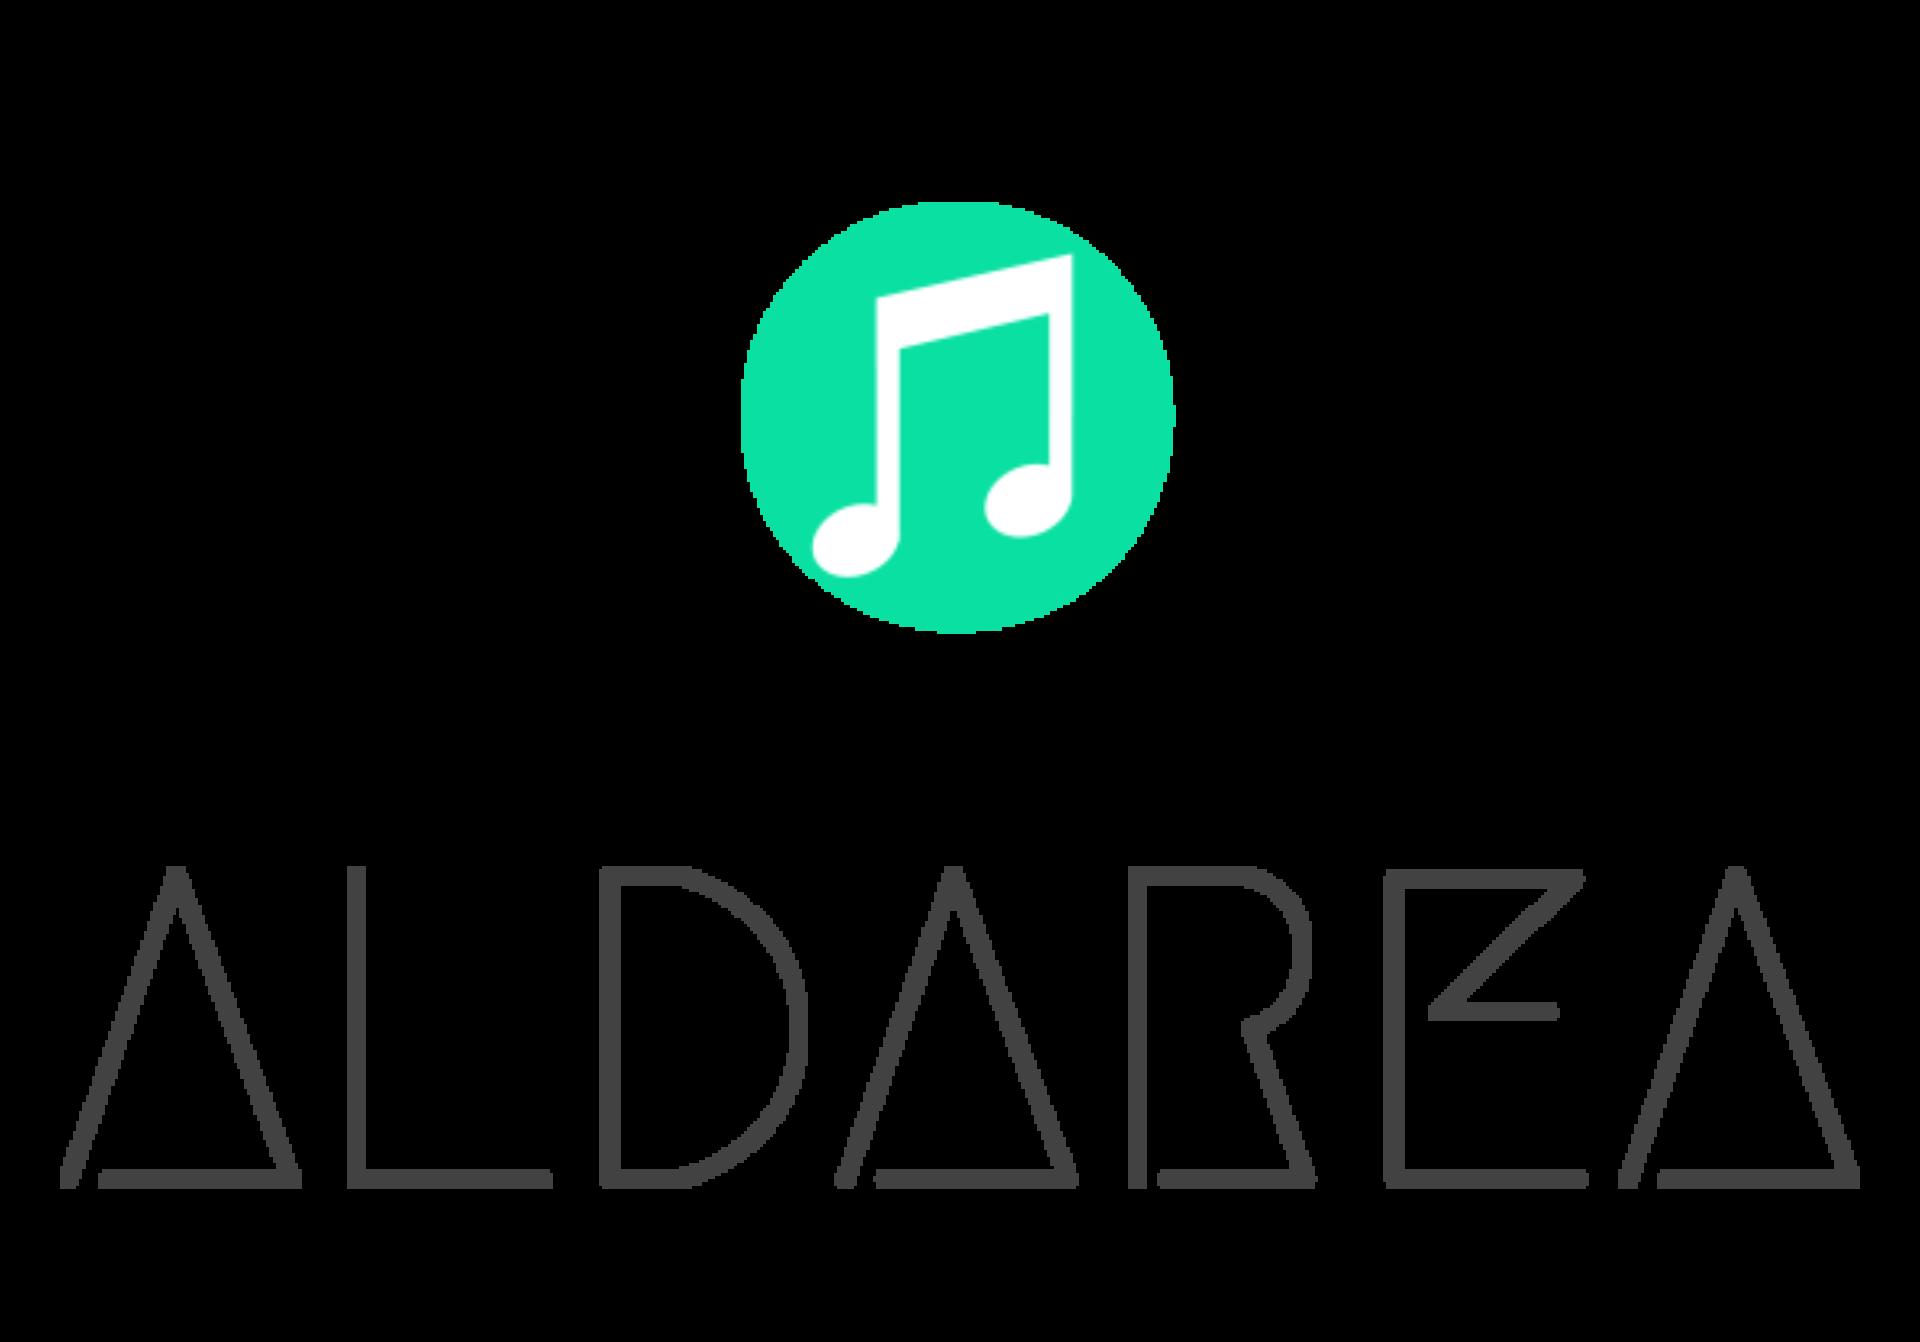 ALDÁREA-CLM